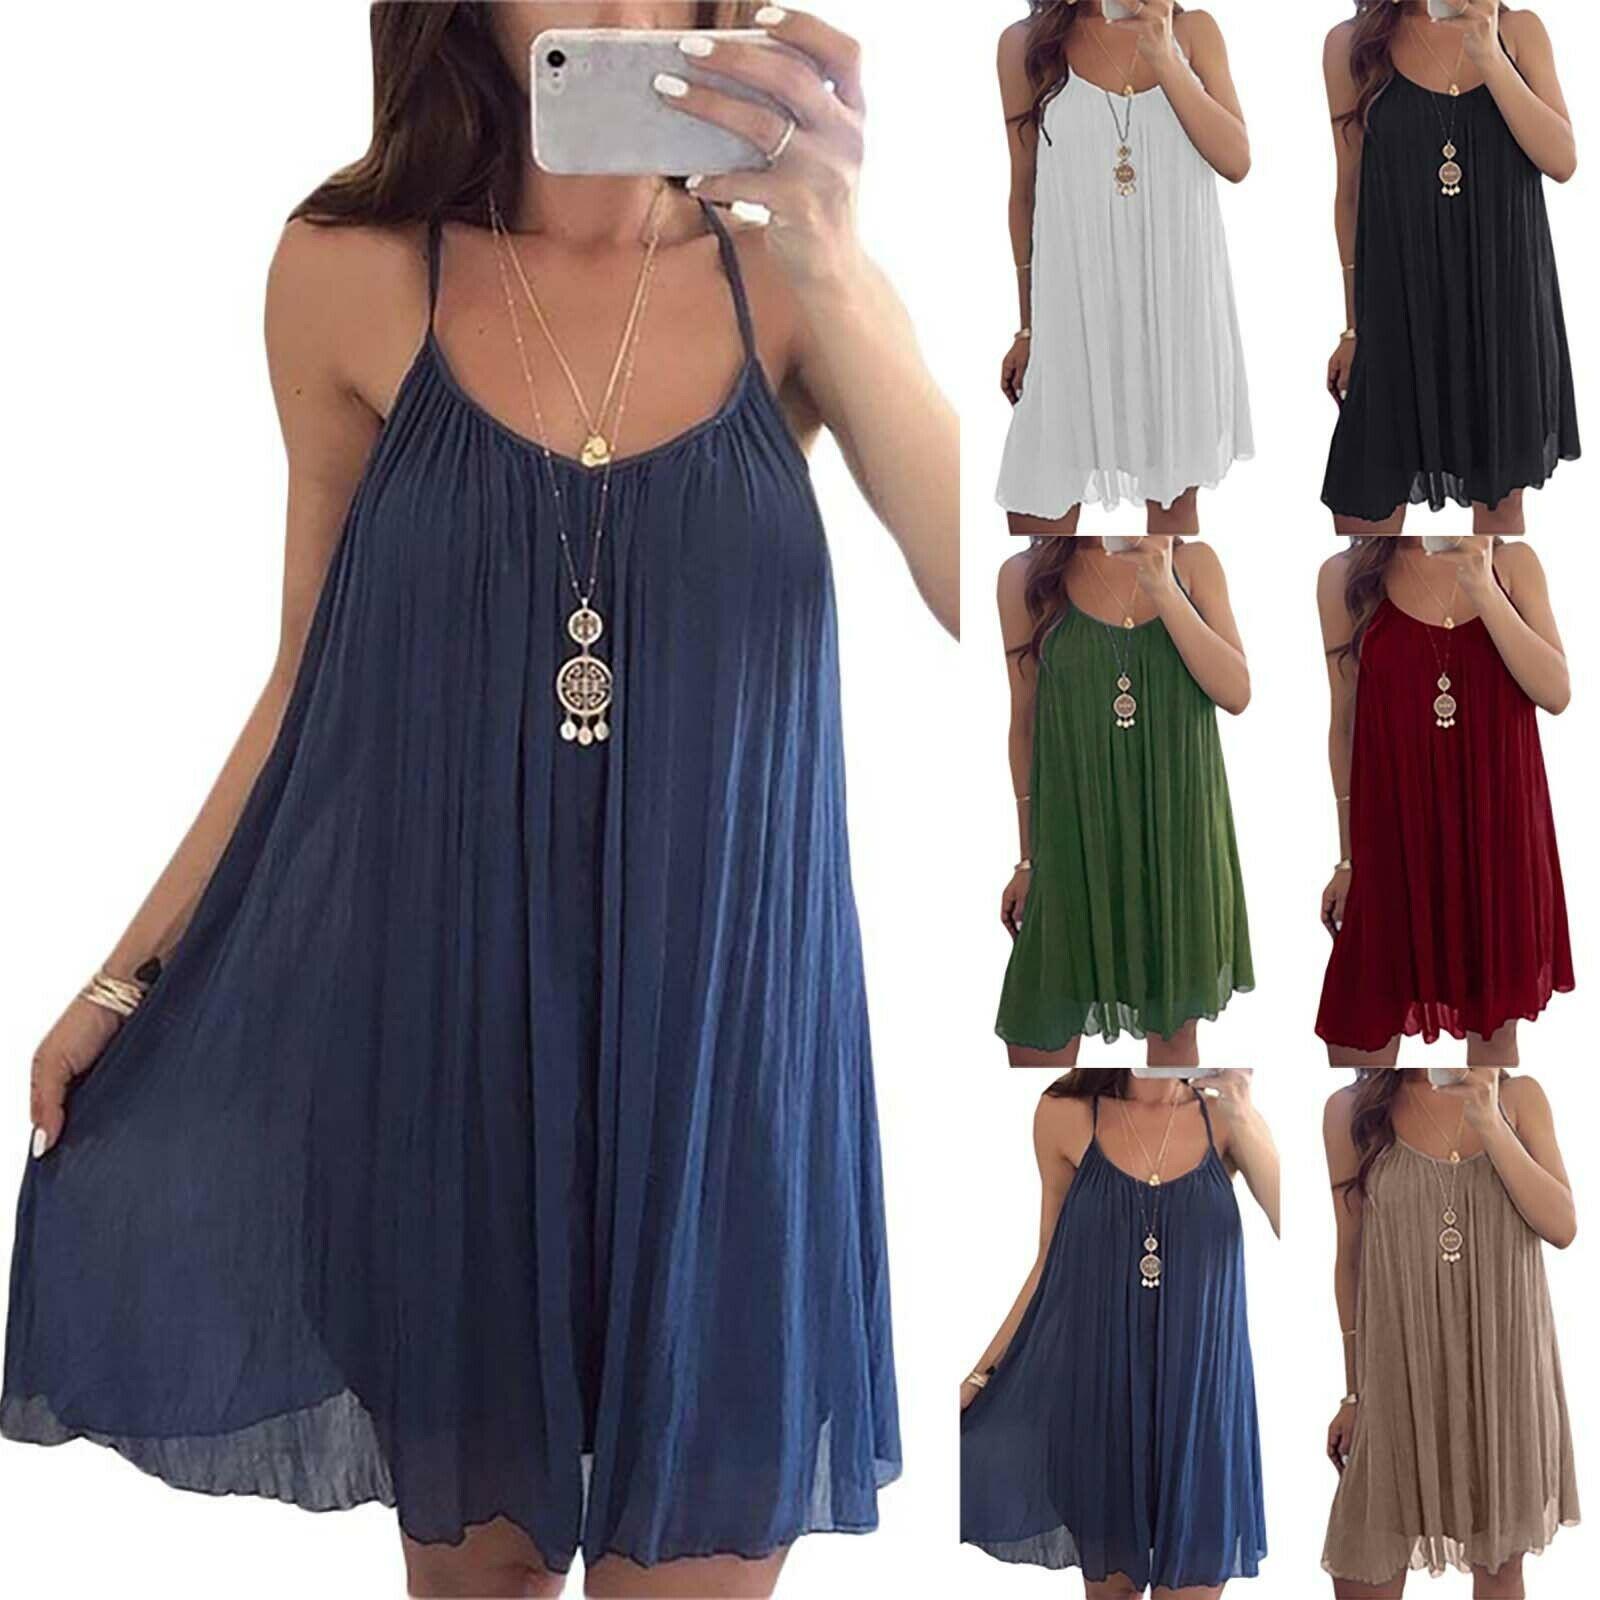 Damen Trägerkleid Sommerkleid Knielang Lose Tunika Kleider